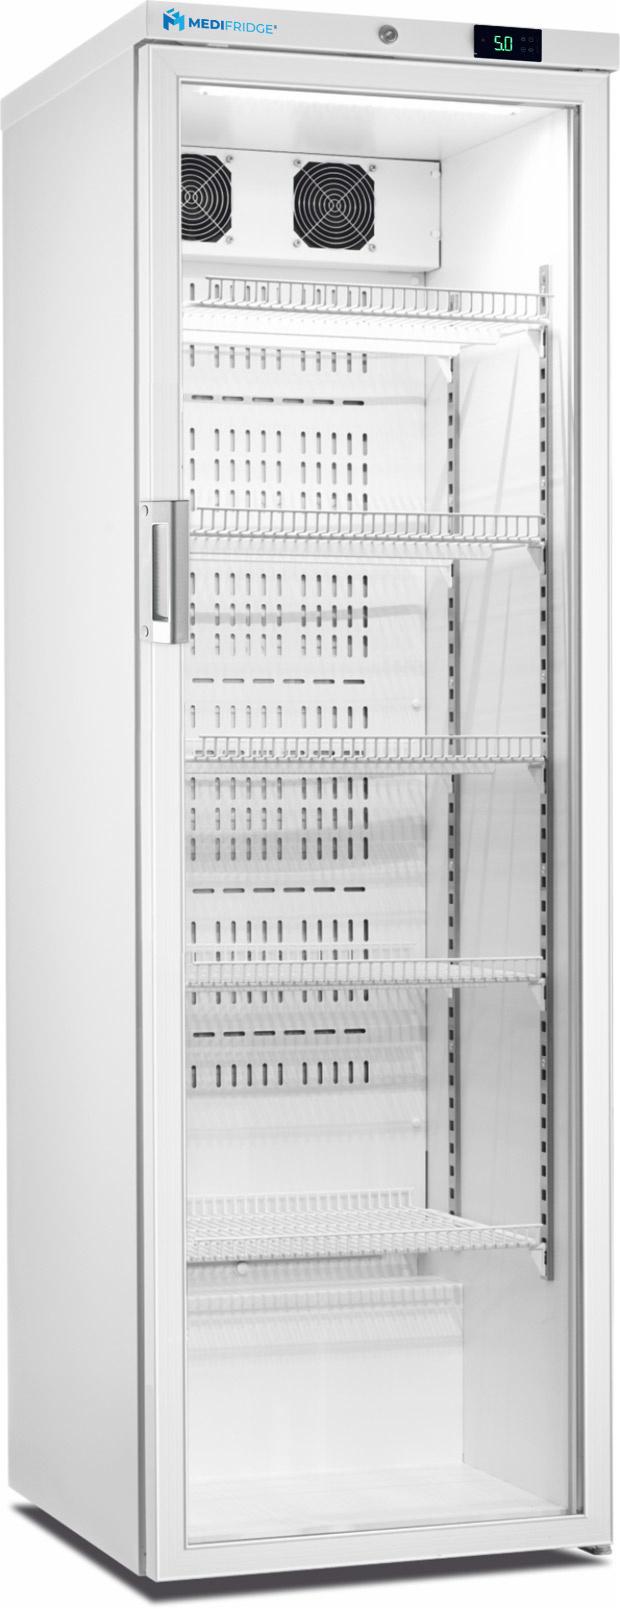 MediFridge medicine refrigerator MF450L-GD - Glass door - 416 liters - 600x700x1875 mm - DIN 58345